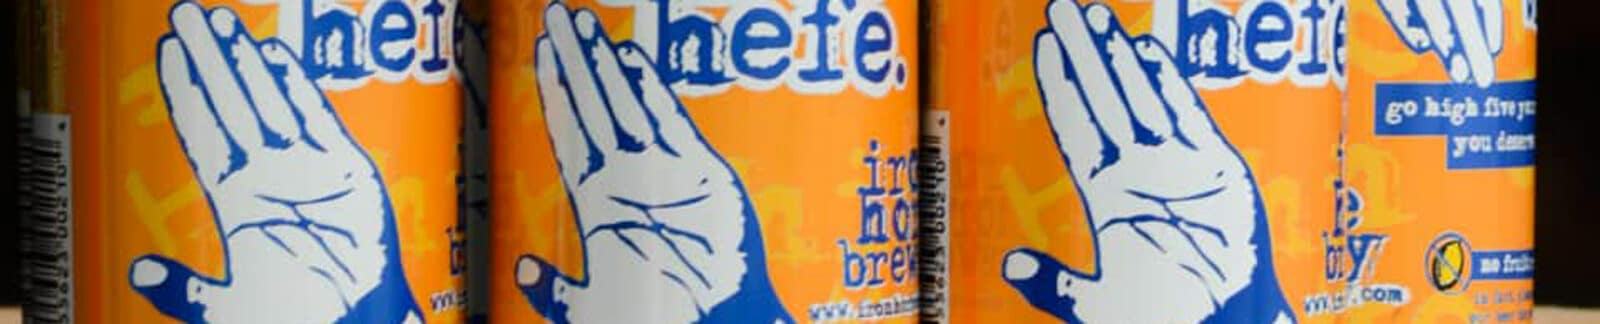 High Five Hefe American Pale Wheat Ale header